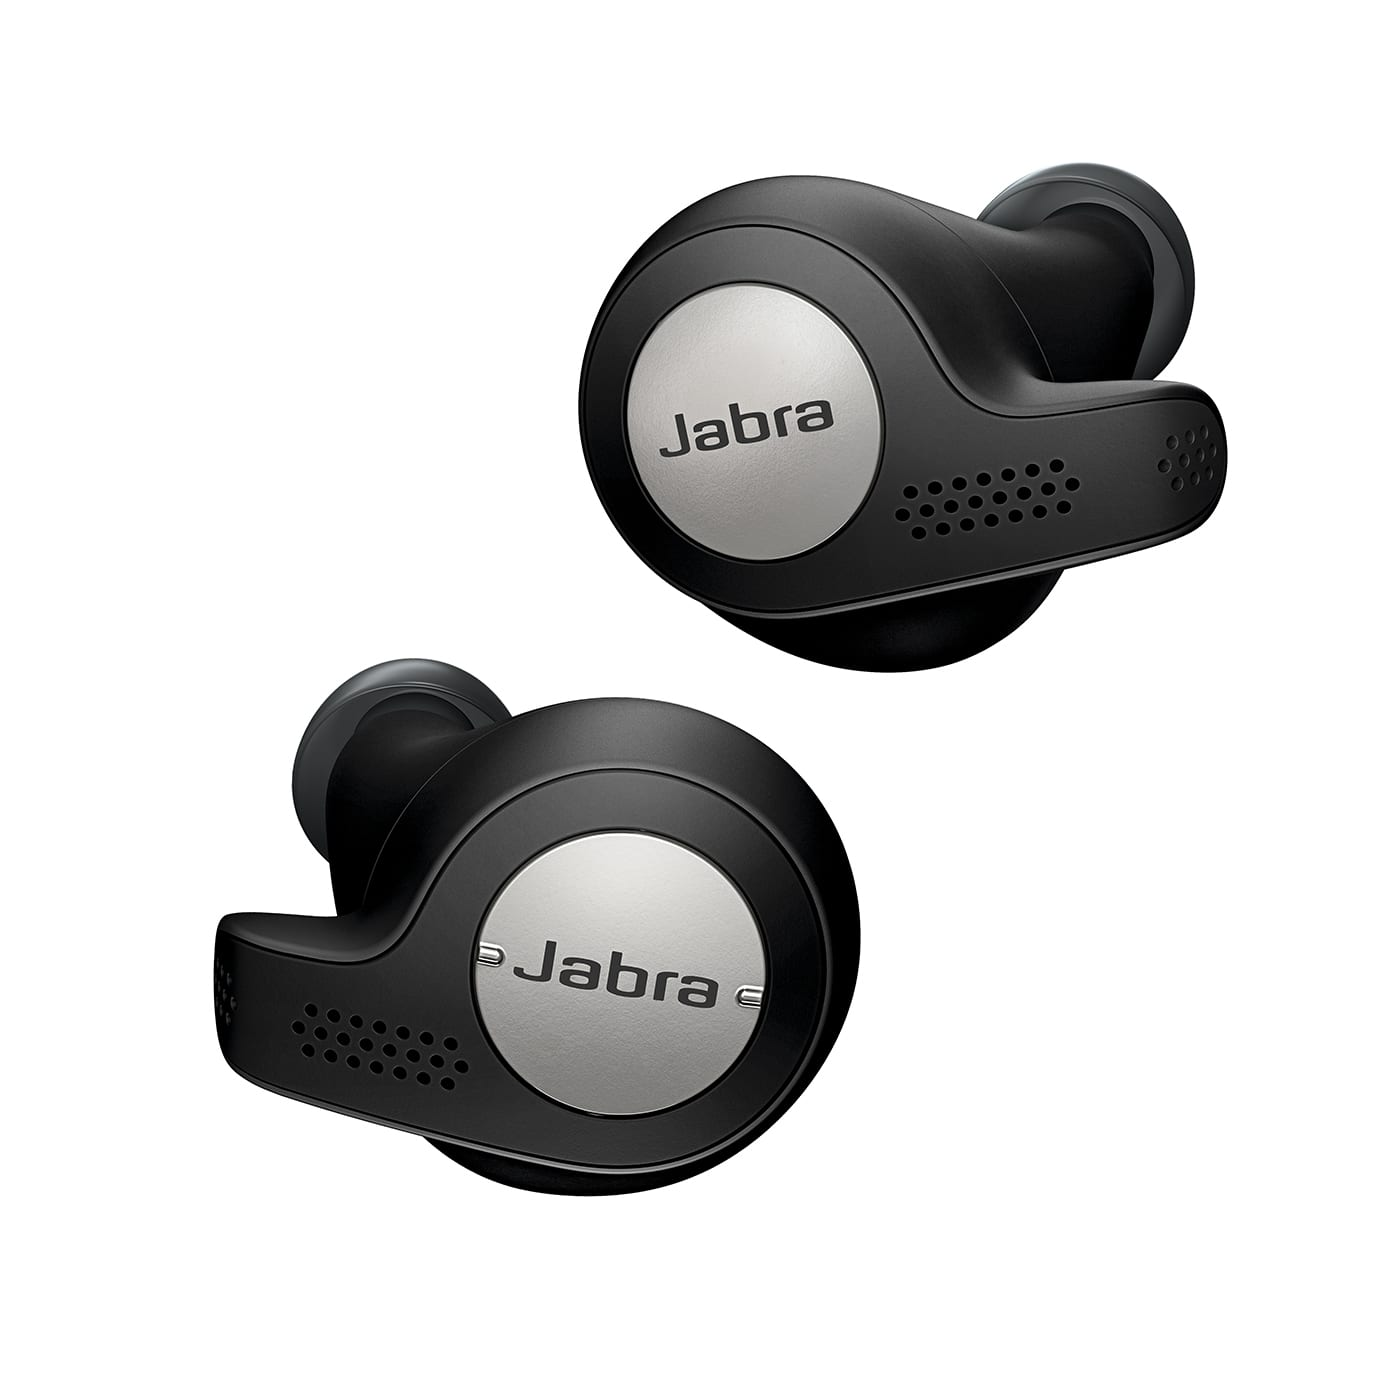 Jabra Elite Active 65t True Wireless Earbuds (Manufacturer Refurbished) $59.99